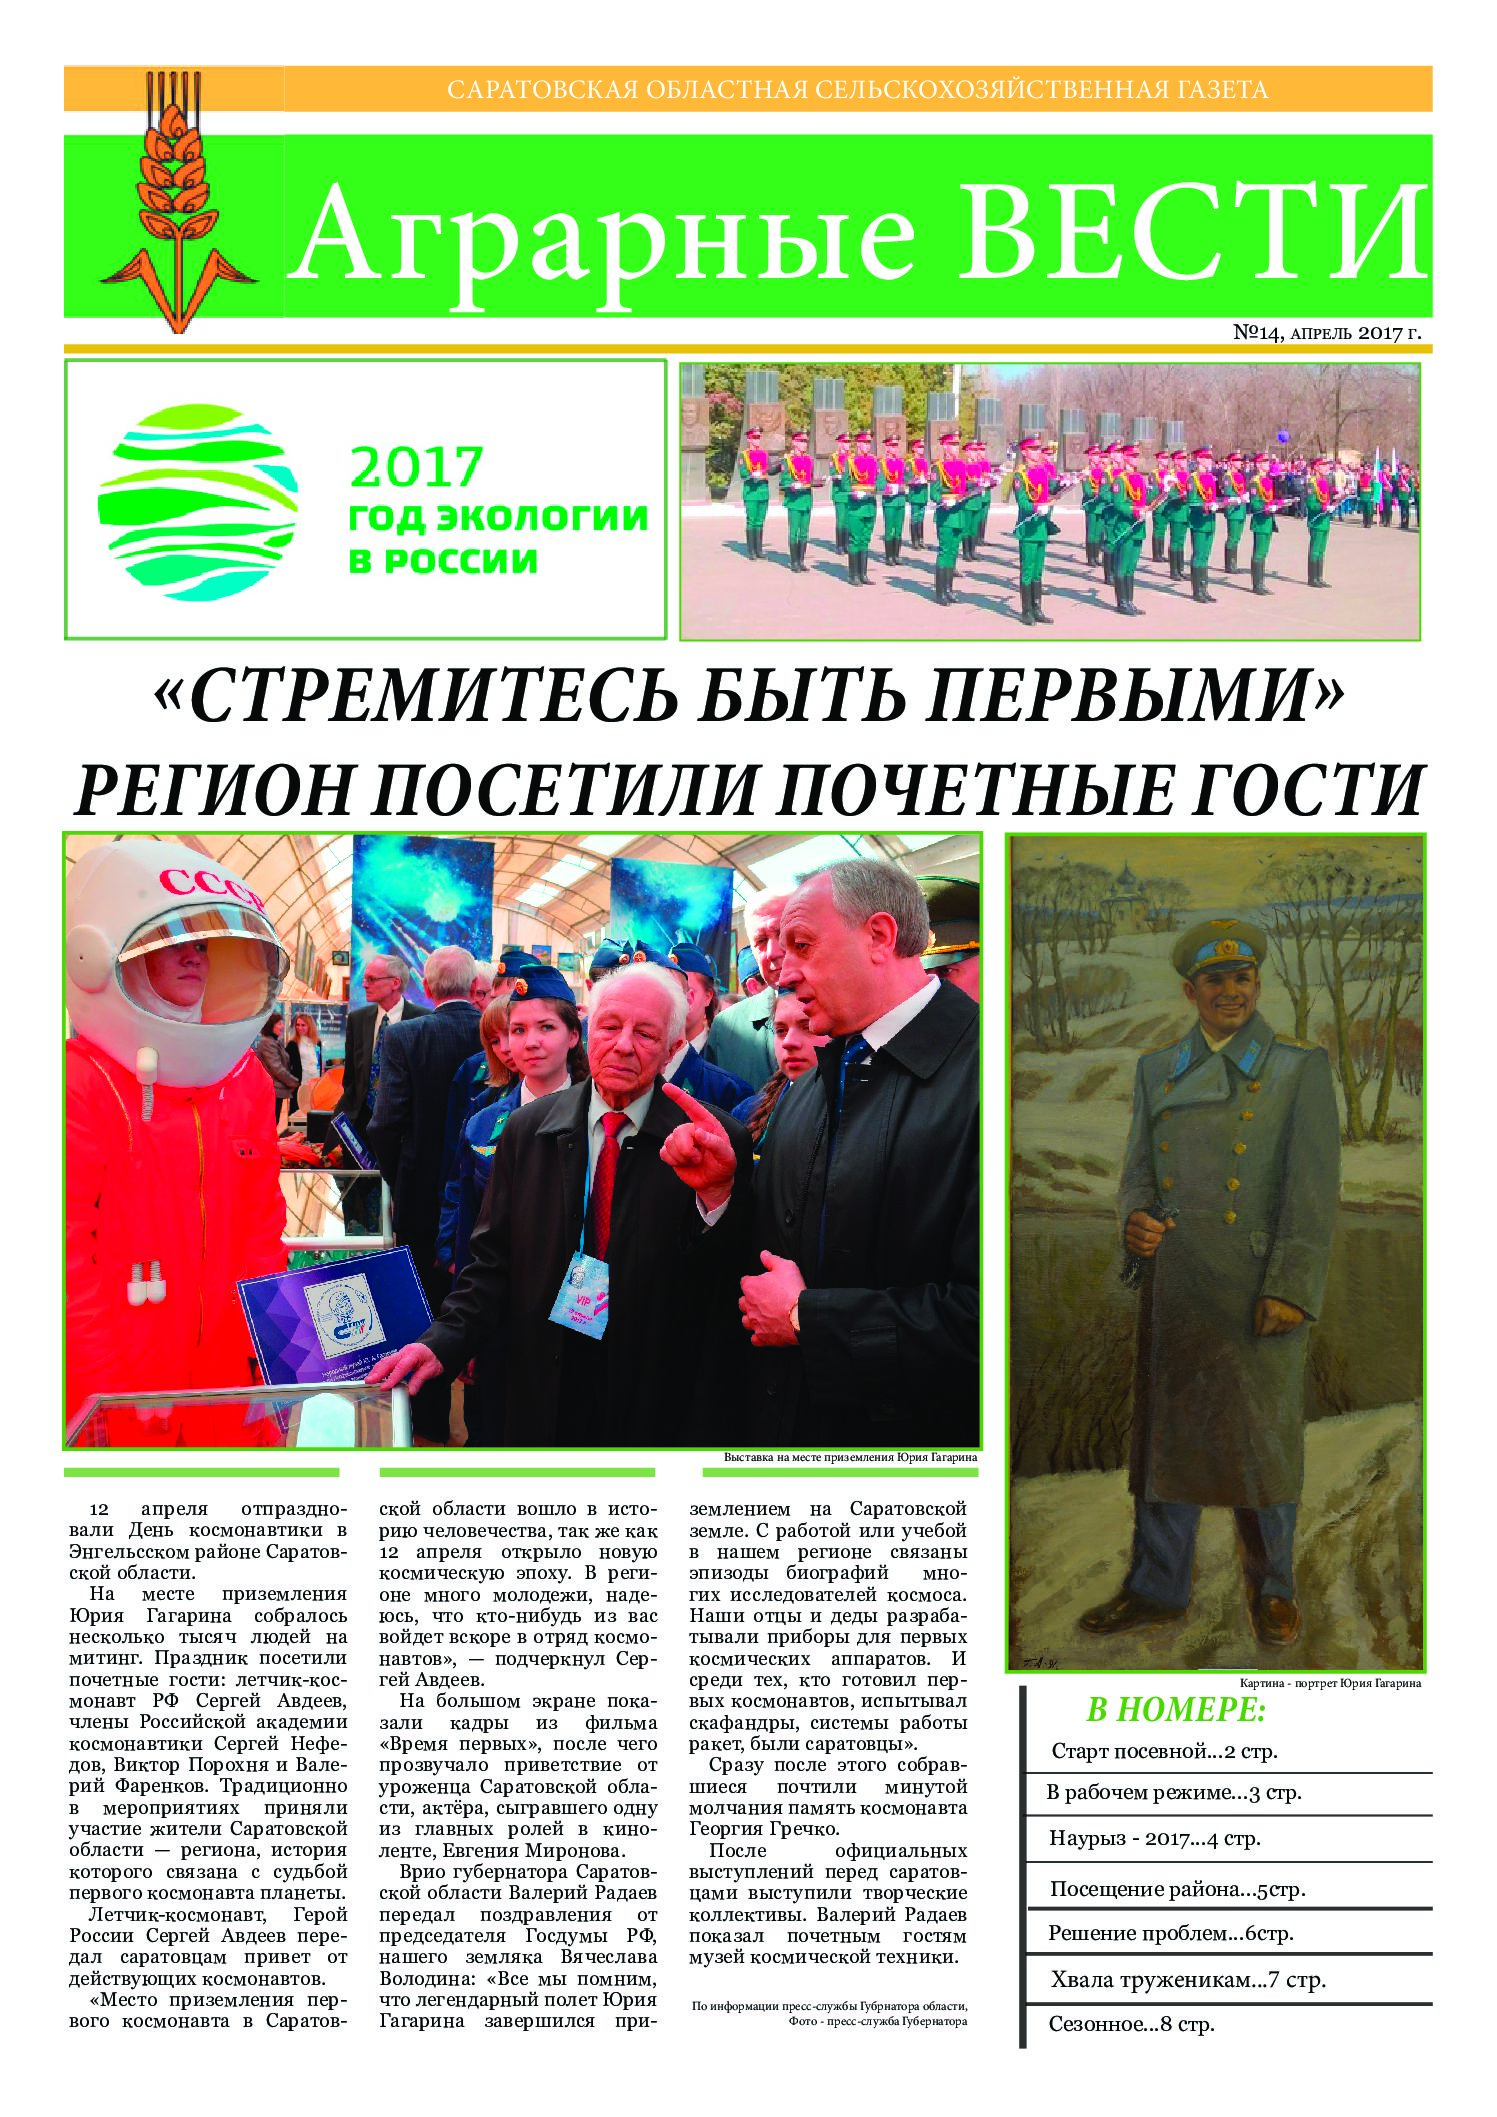 https://saratovagro.ru/wp-content/uploads/2020/08/апрель-14-pdf.jpg